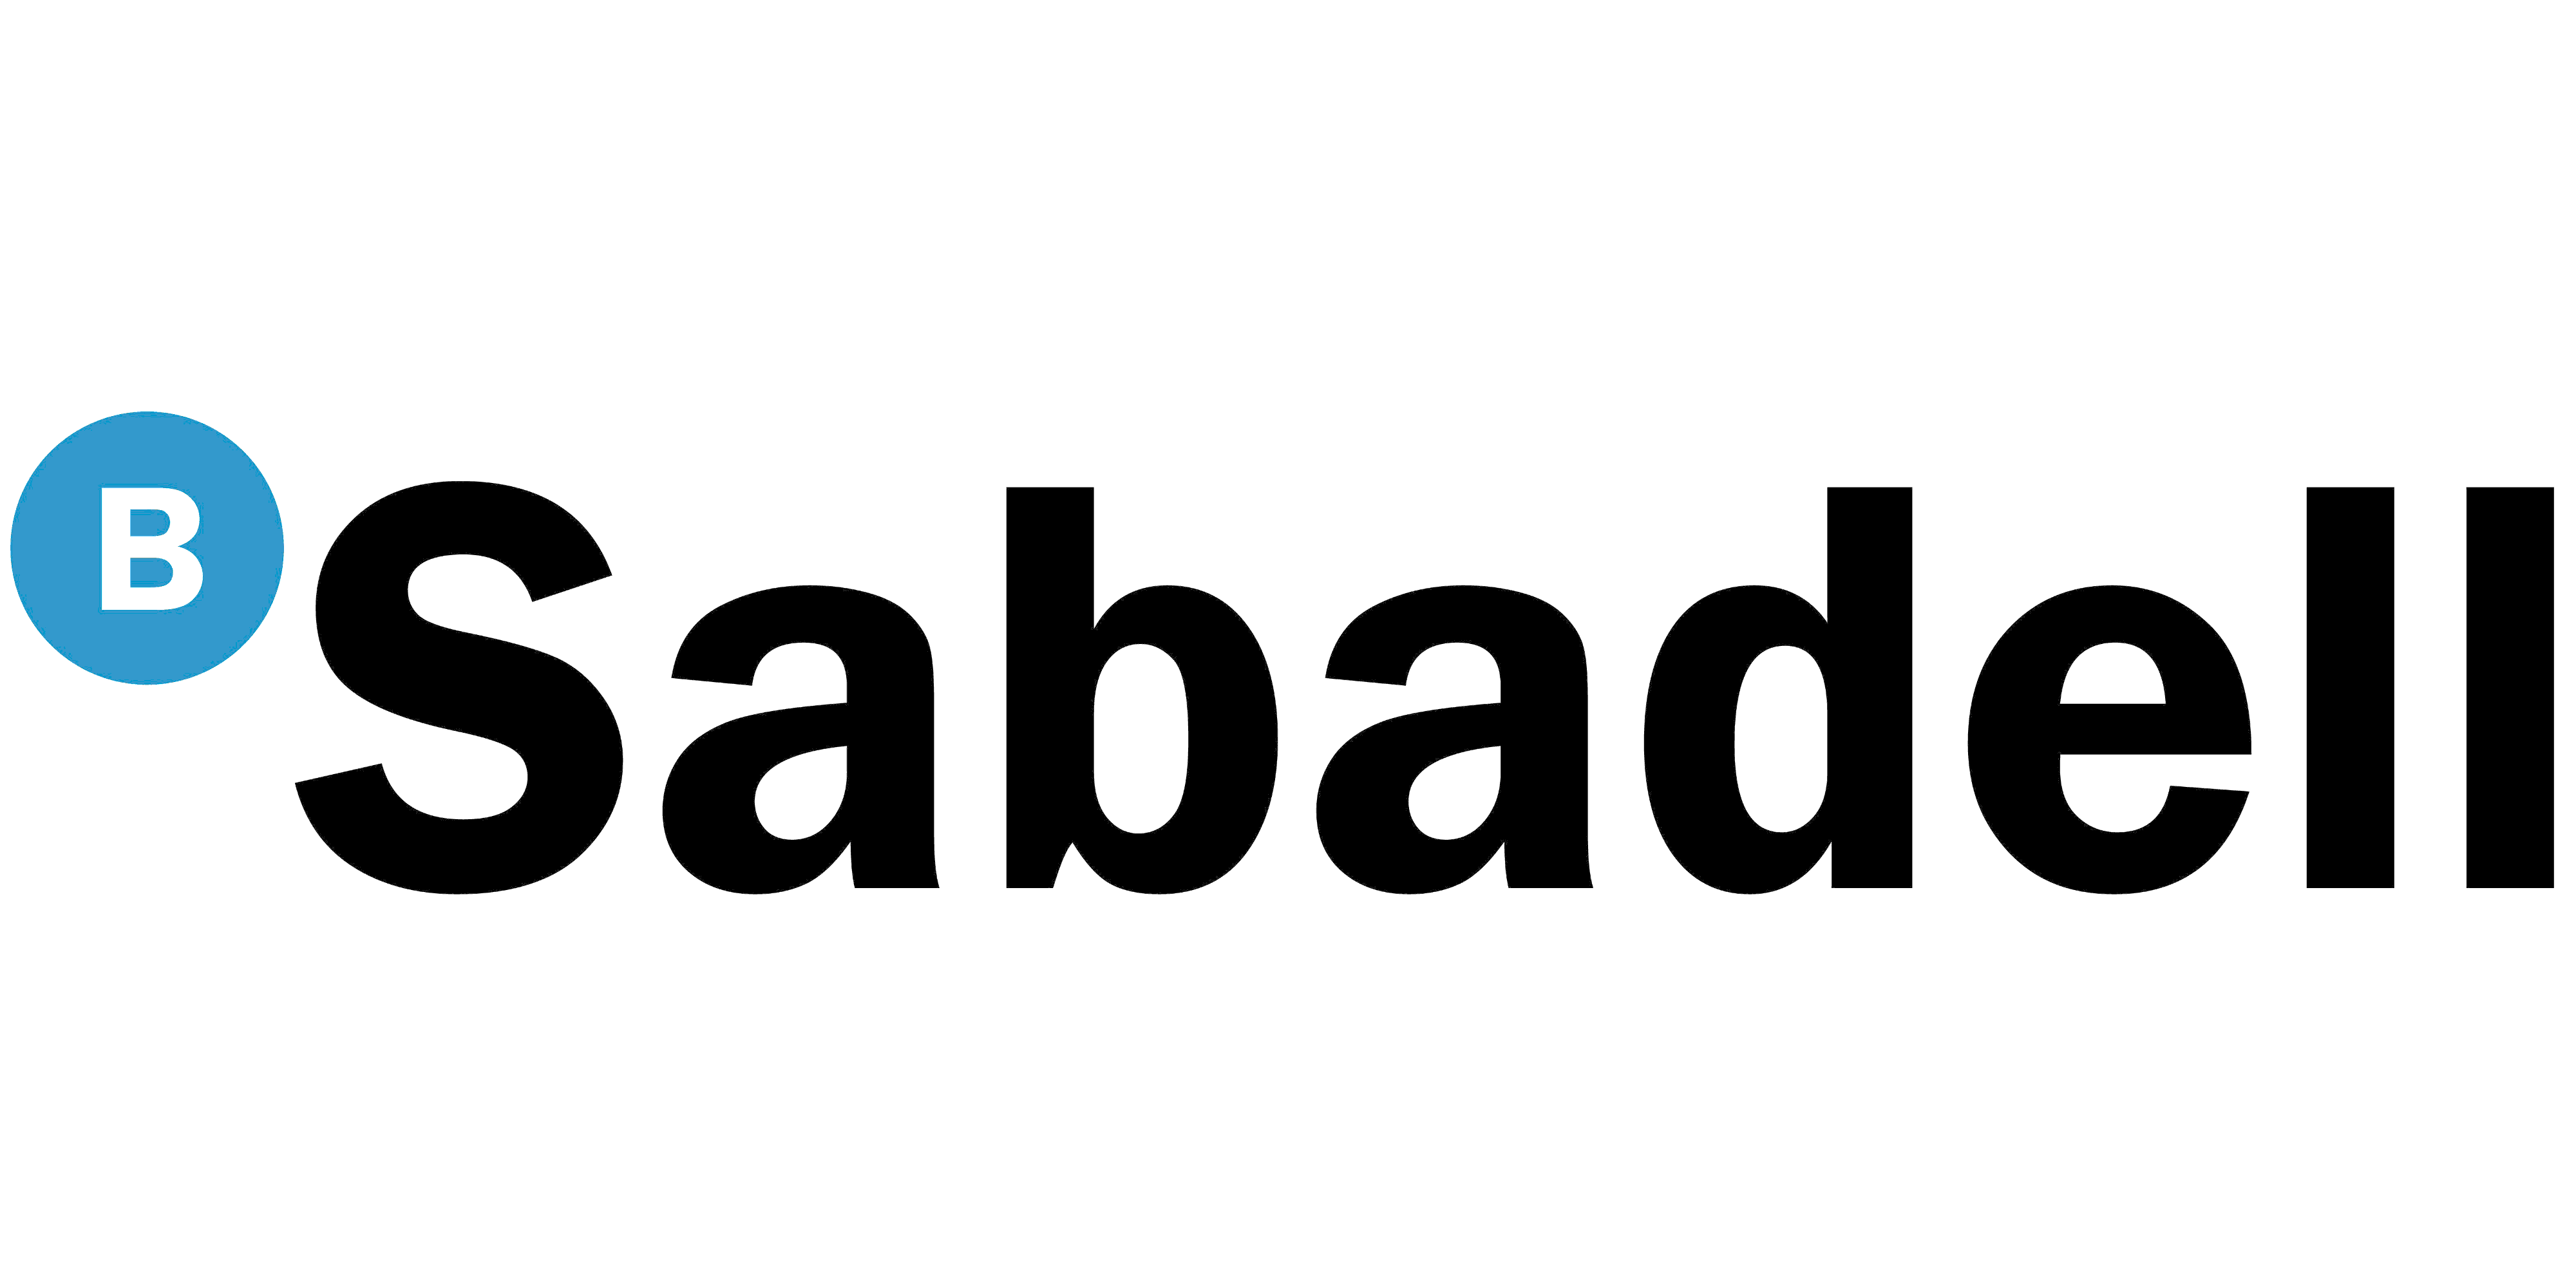 Cuenta expansi n plus de banc sabadell comparativa de - Oficinas banc sabadell ...